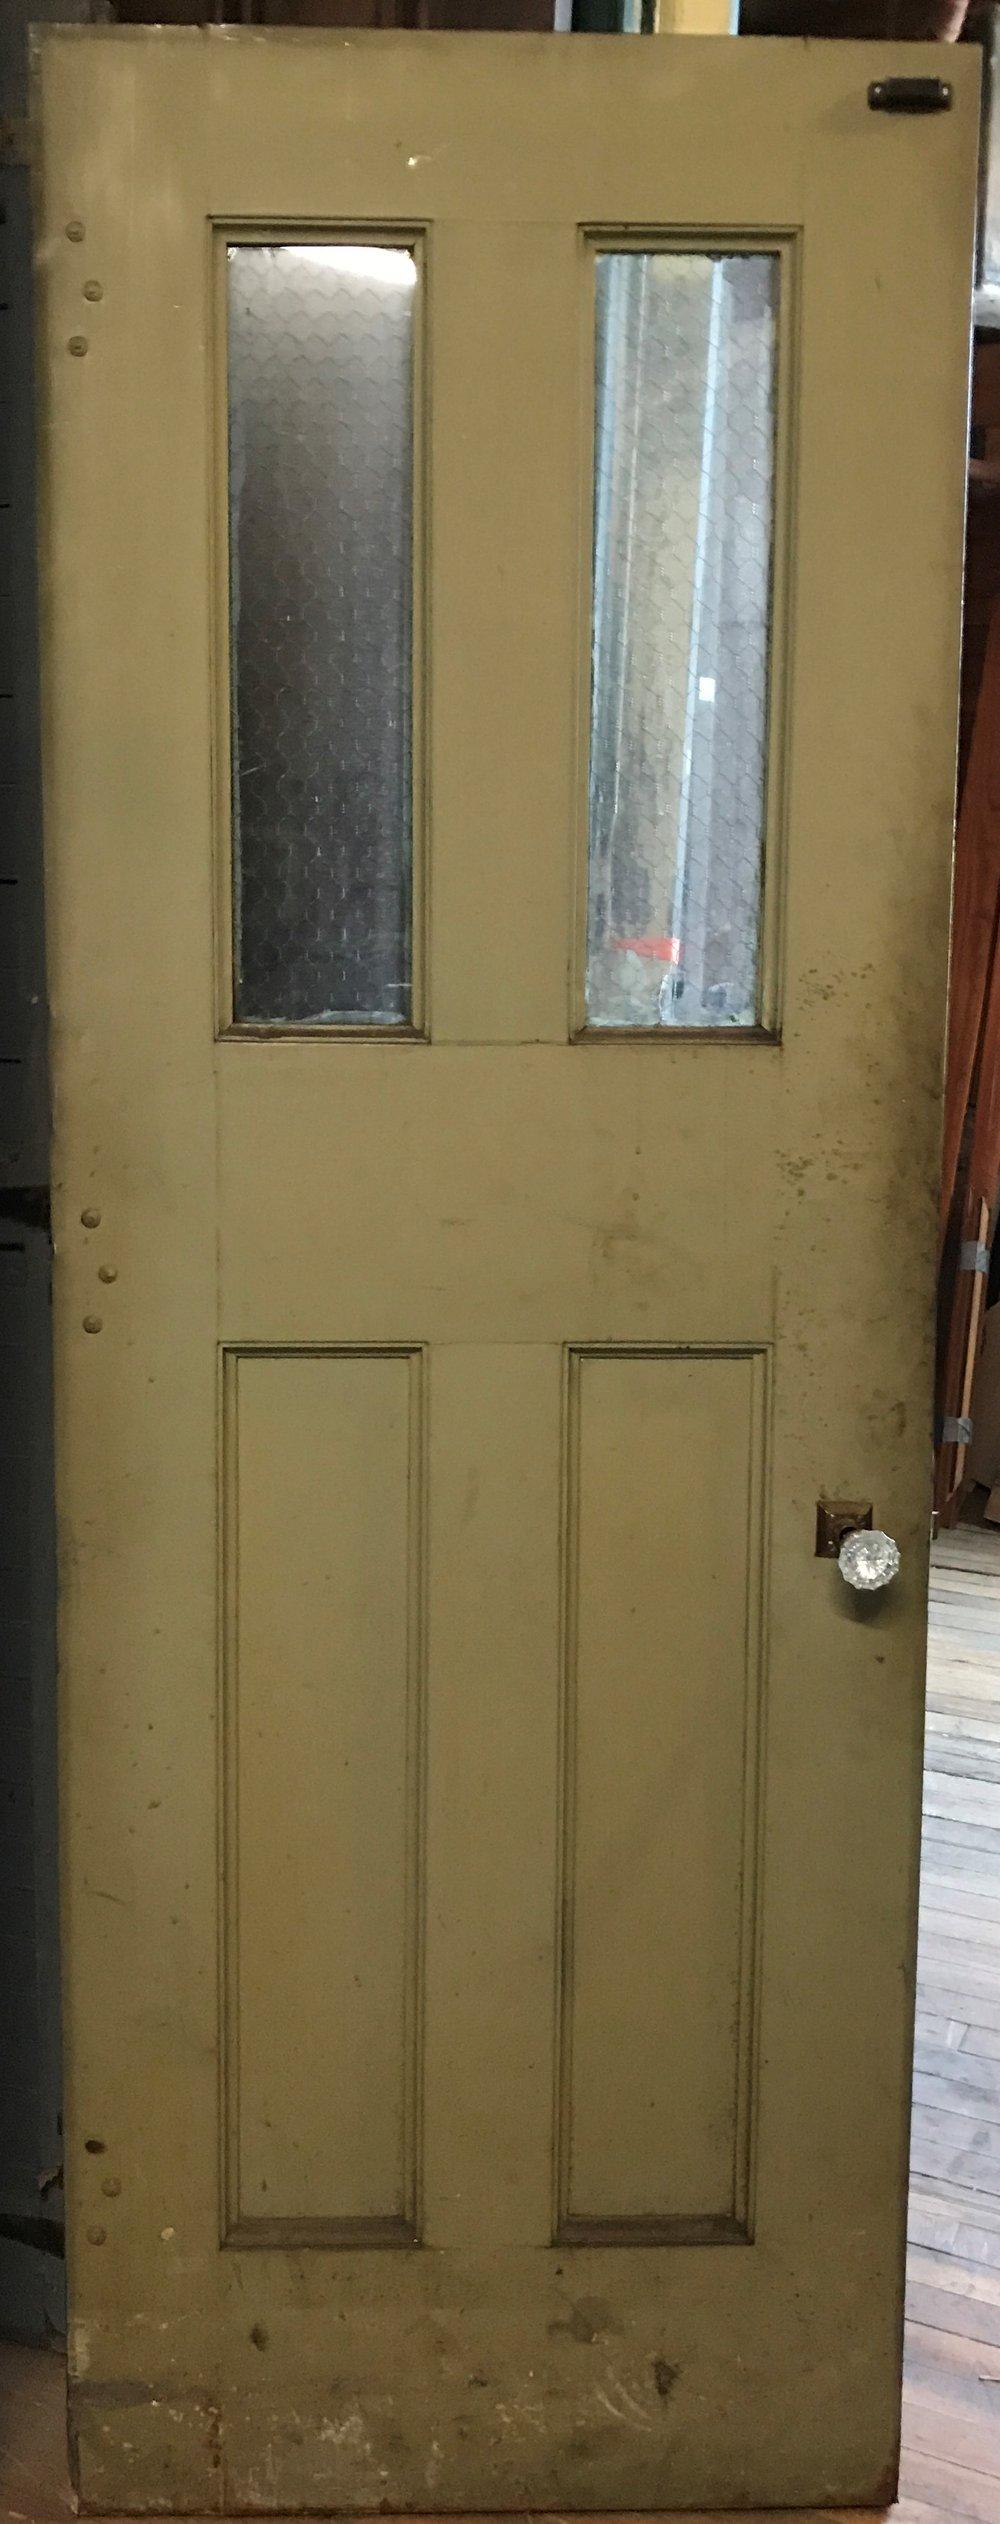 Antique Steel Clad Fire Door with Chicken Wire Glass